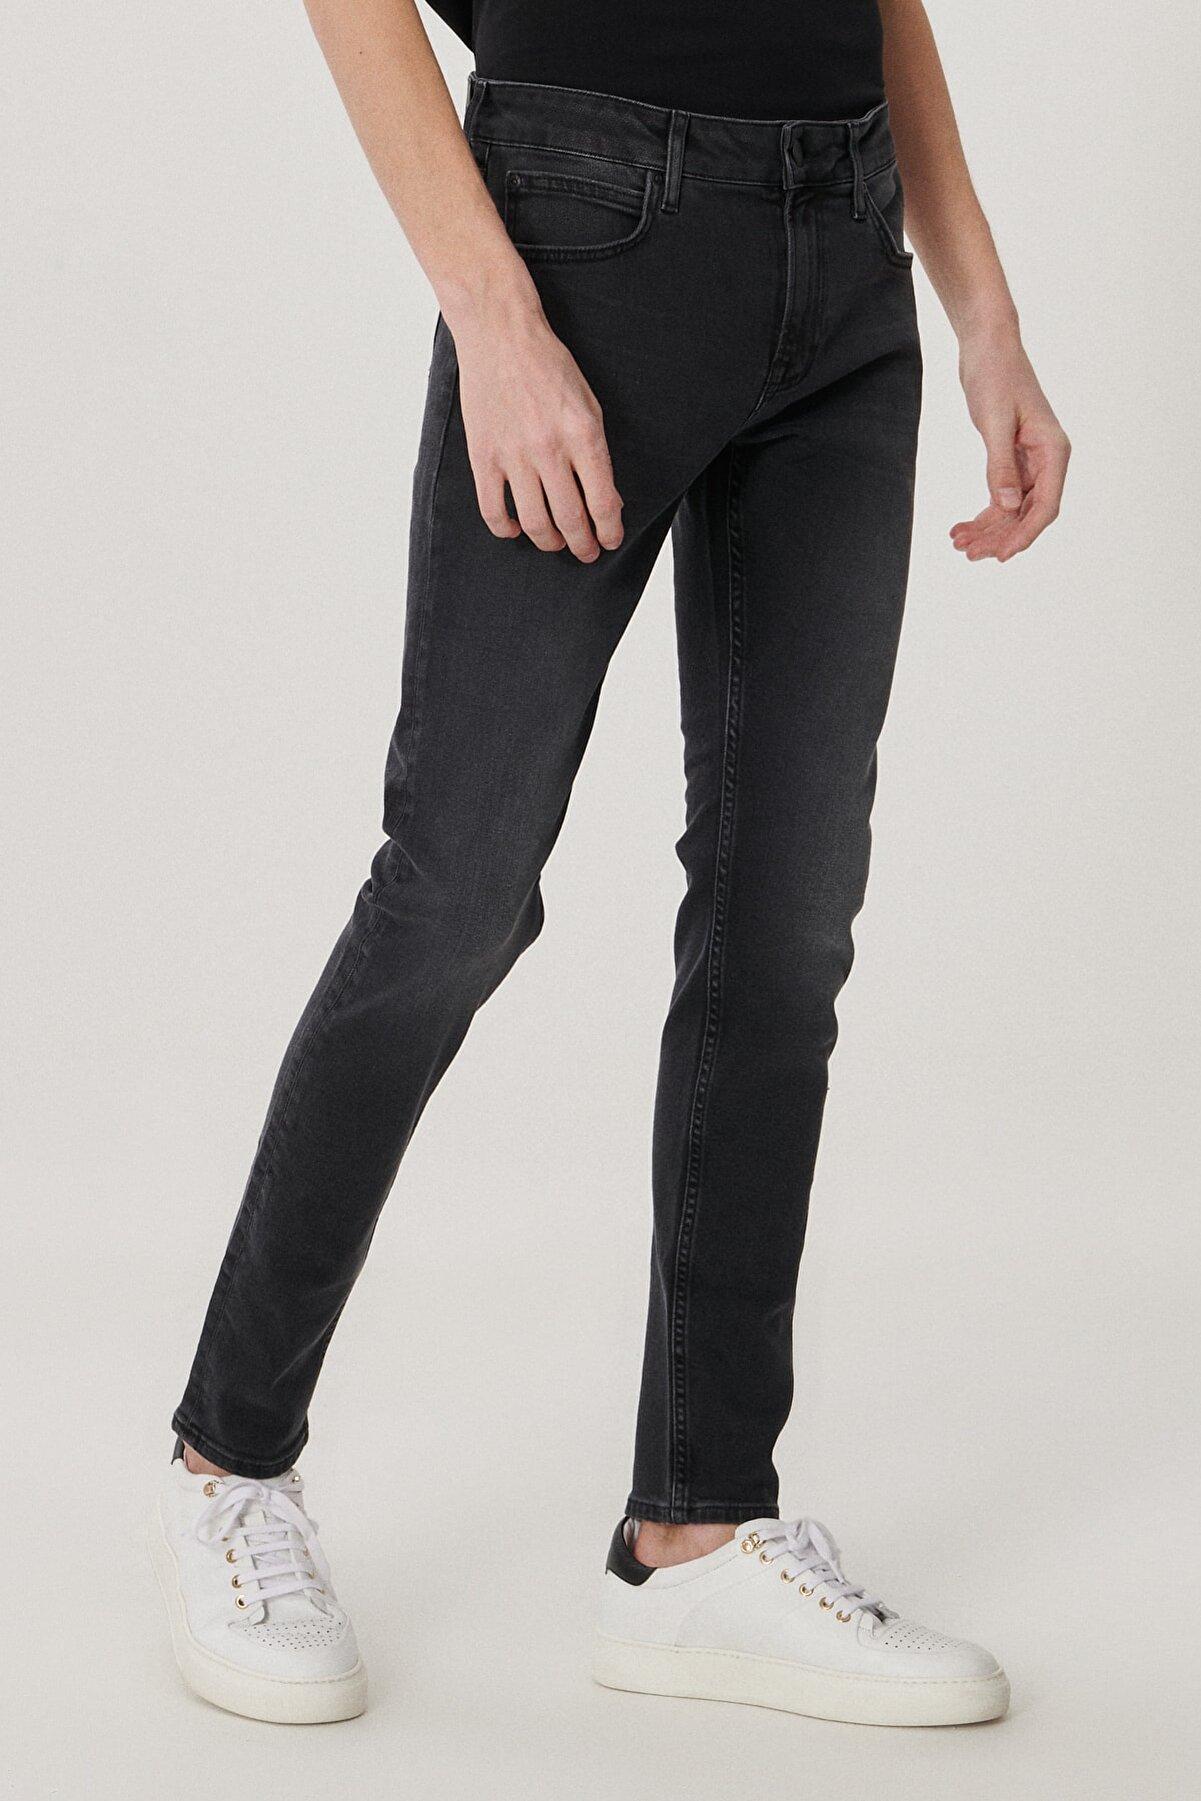 Lee Malone Erkek Koyu Gri Skinny Normal Bel Çok Dar Paça Esnek Jean Pantolon